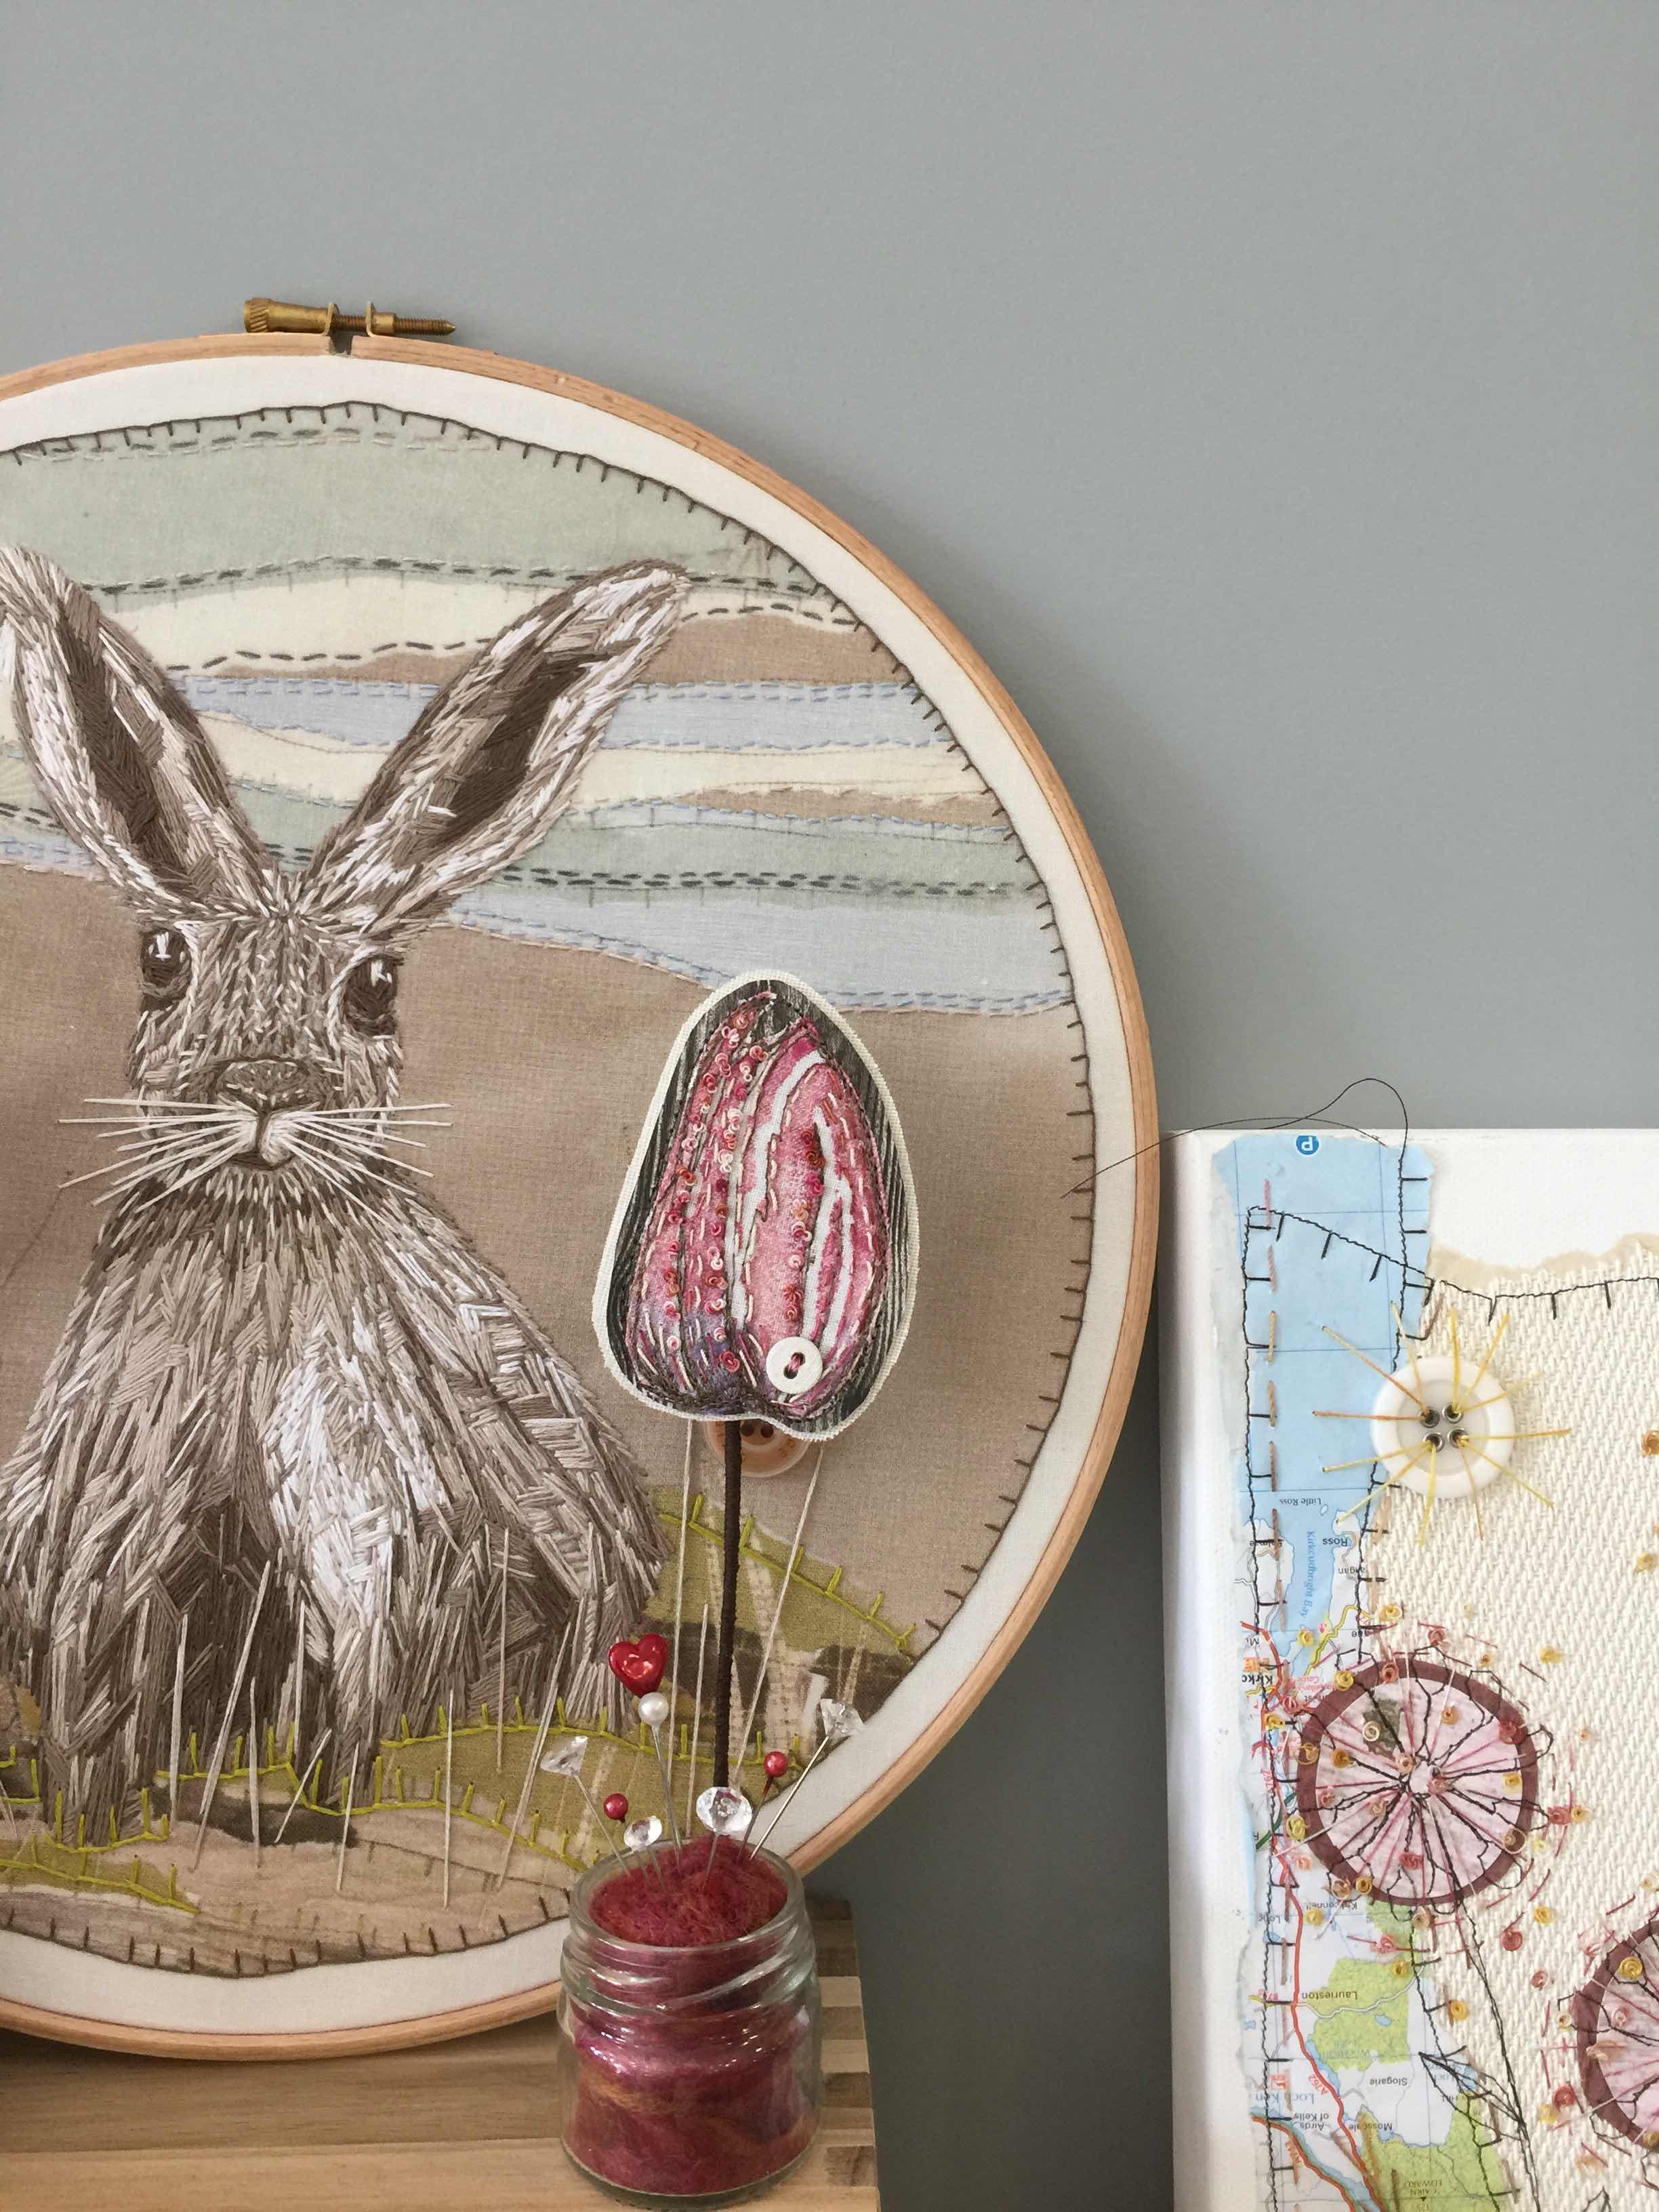 Ann Brooke's textile art